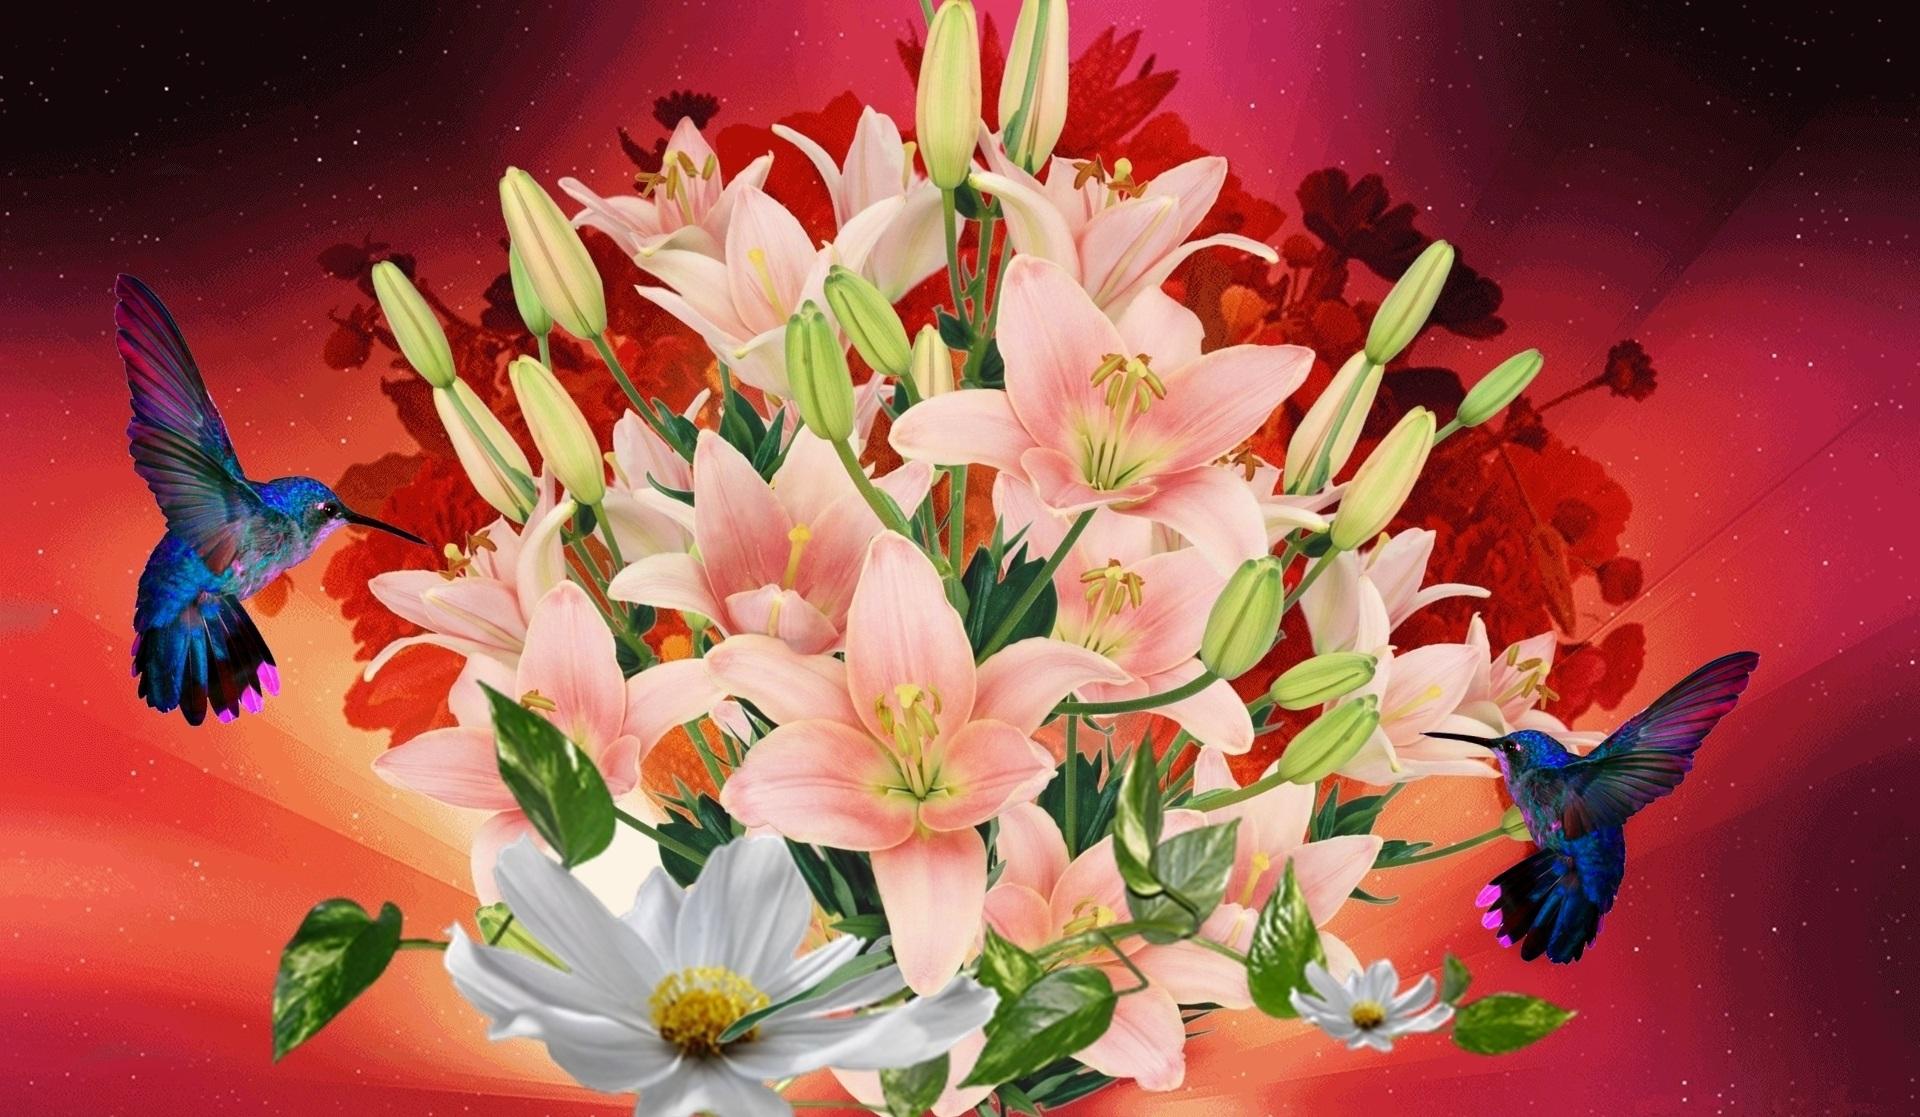 Download 52 Koleksi Wallpaper Bunga Lili Paling Keren